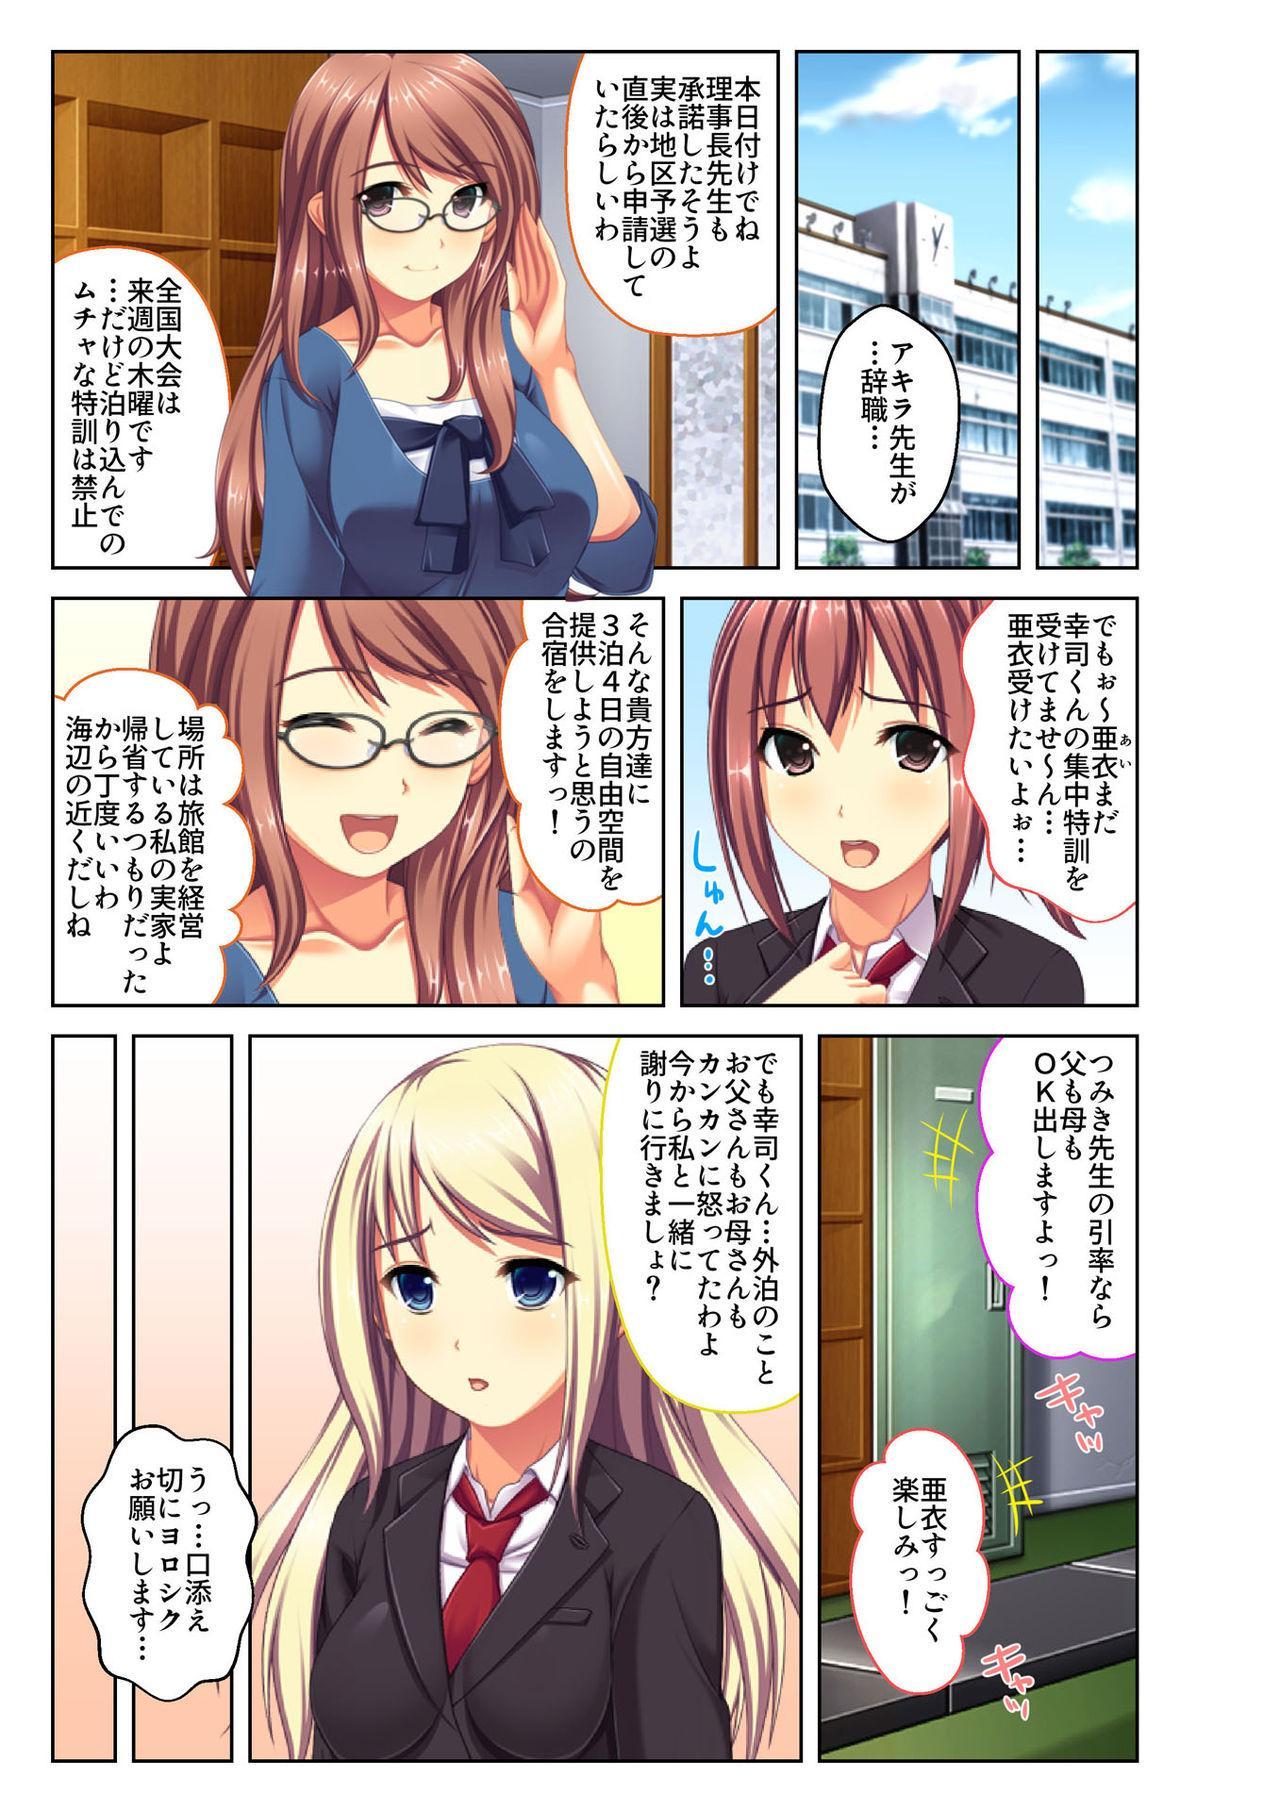 [Drops!] Gohoubi Ecchi! ~Mizugi o Zurashite Sukinadake~ 4 11